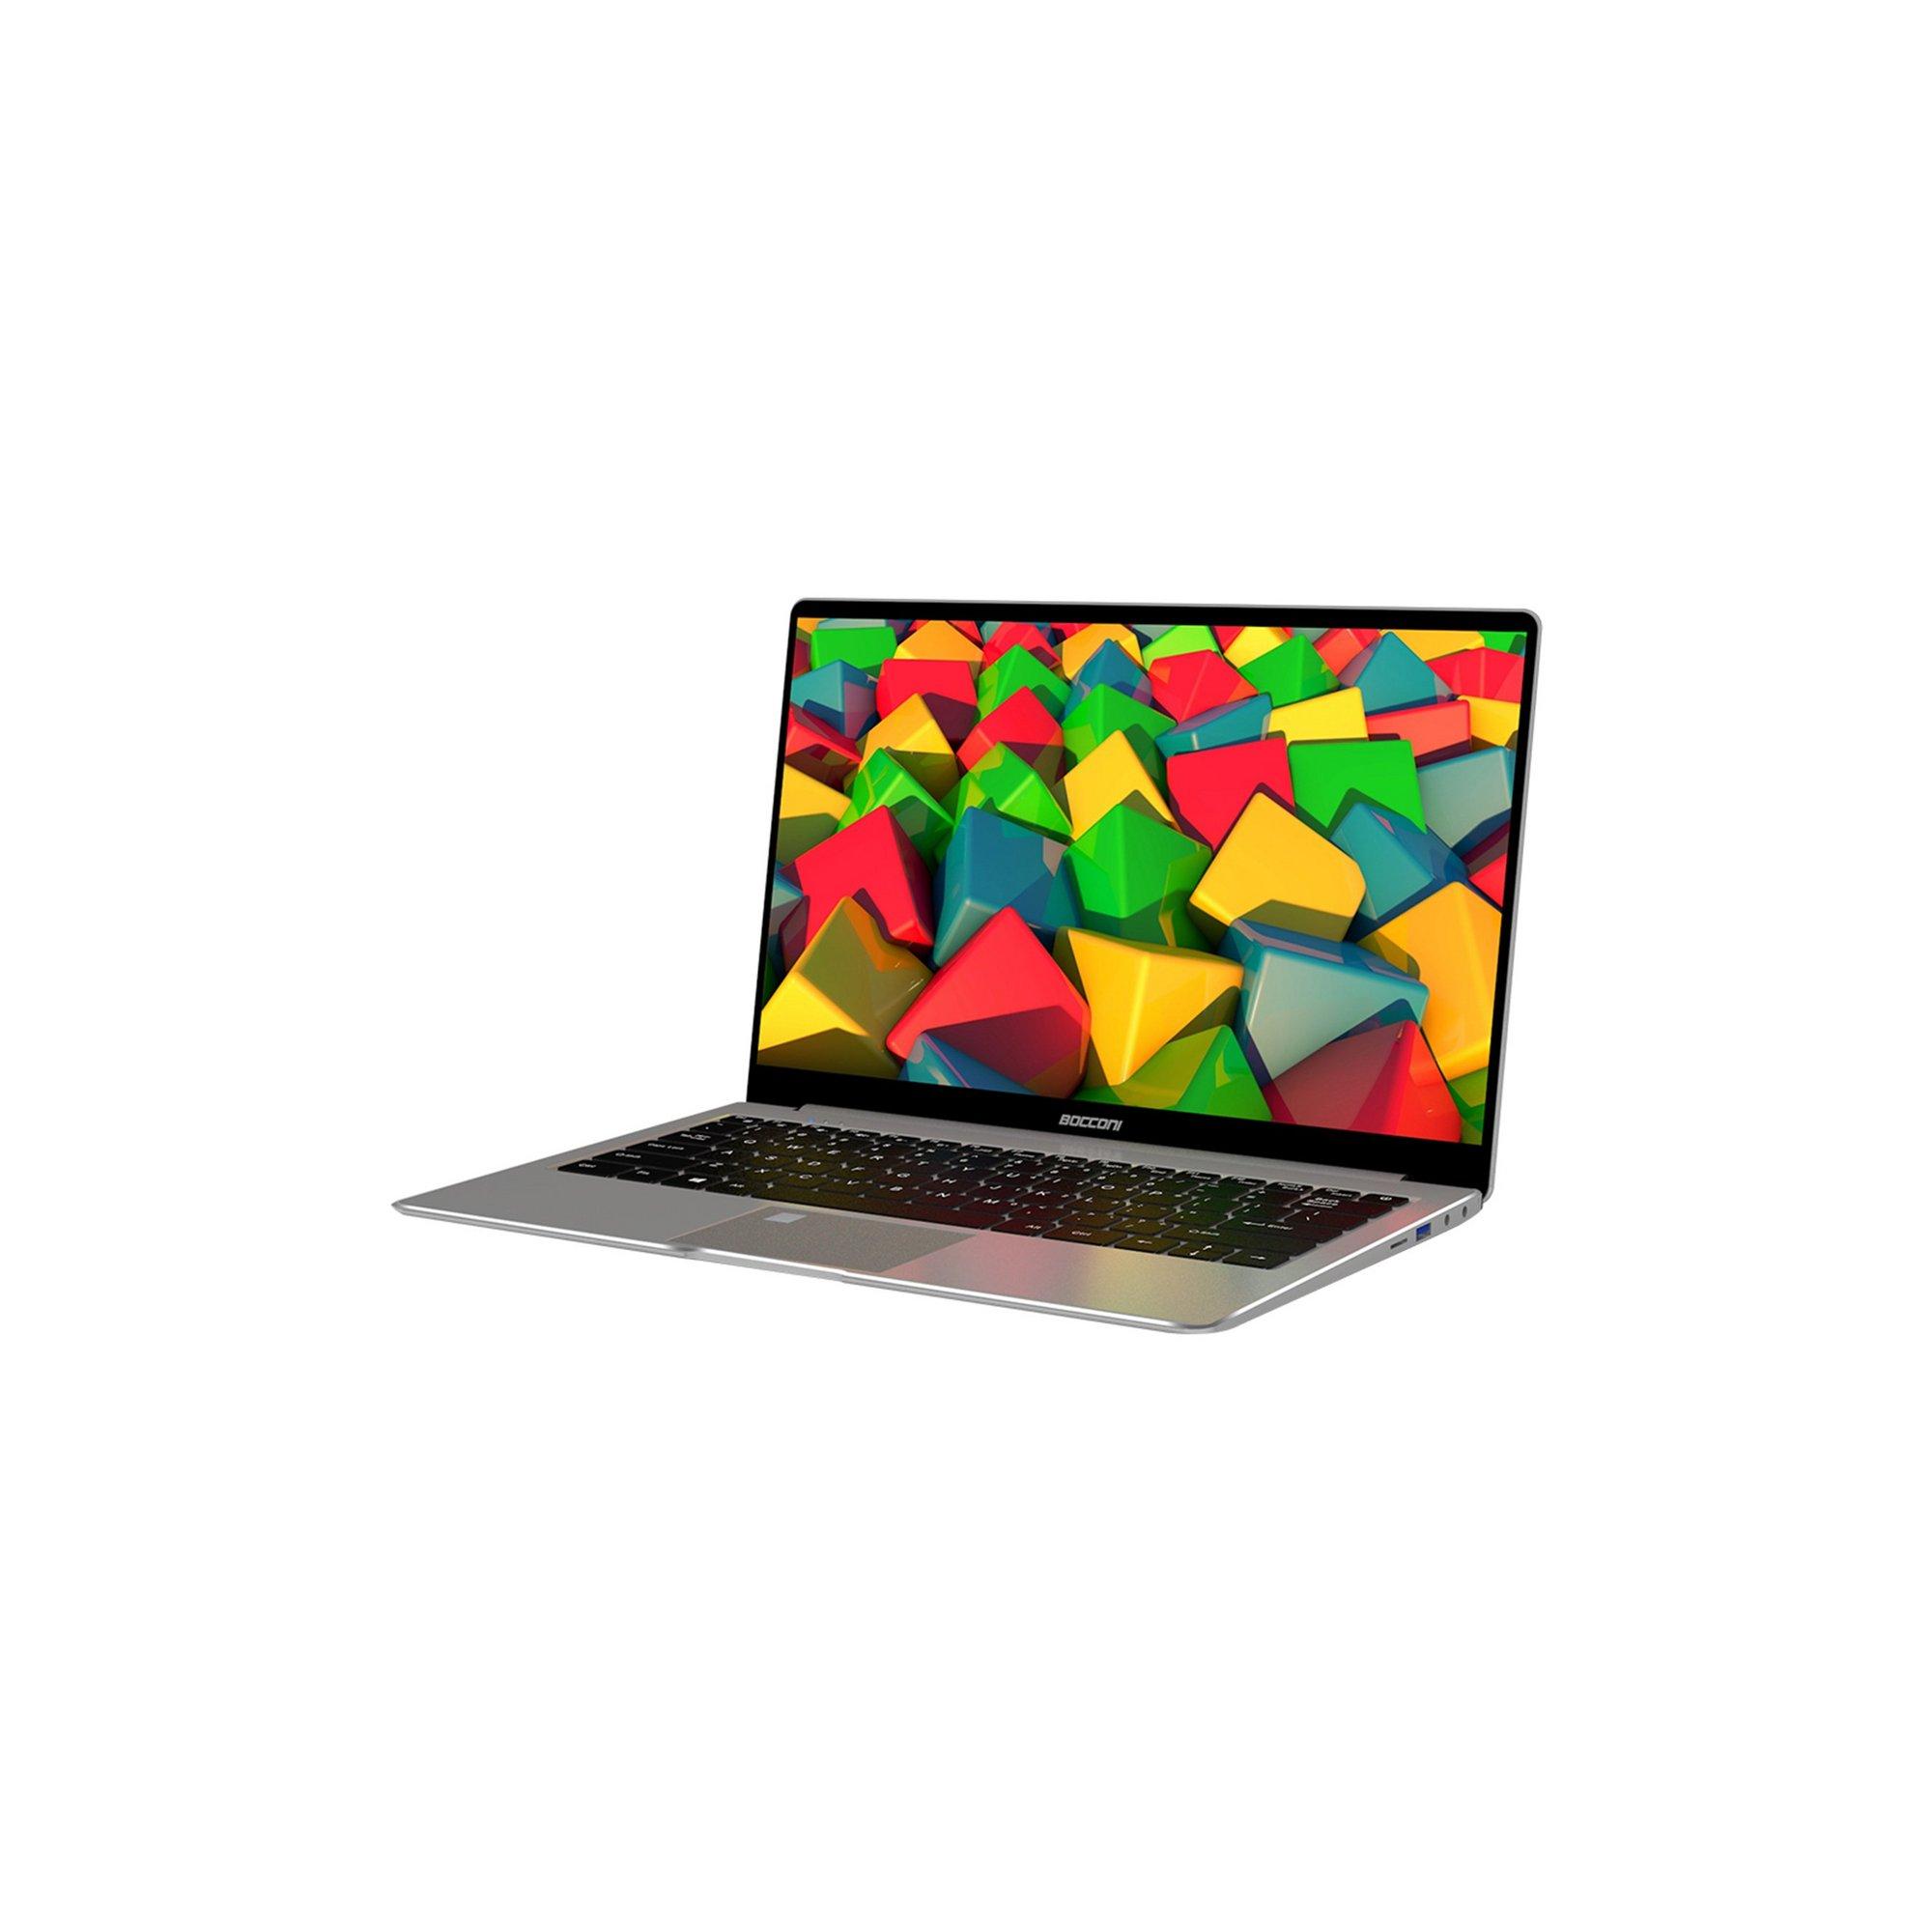 Image of Bocconi V125A 12.5 Inch Metal 2K Screen Windows 10 256GB Laptop +...